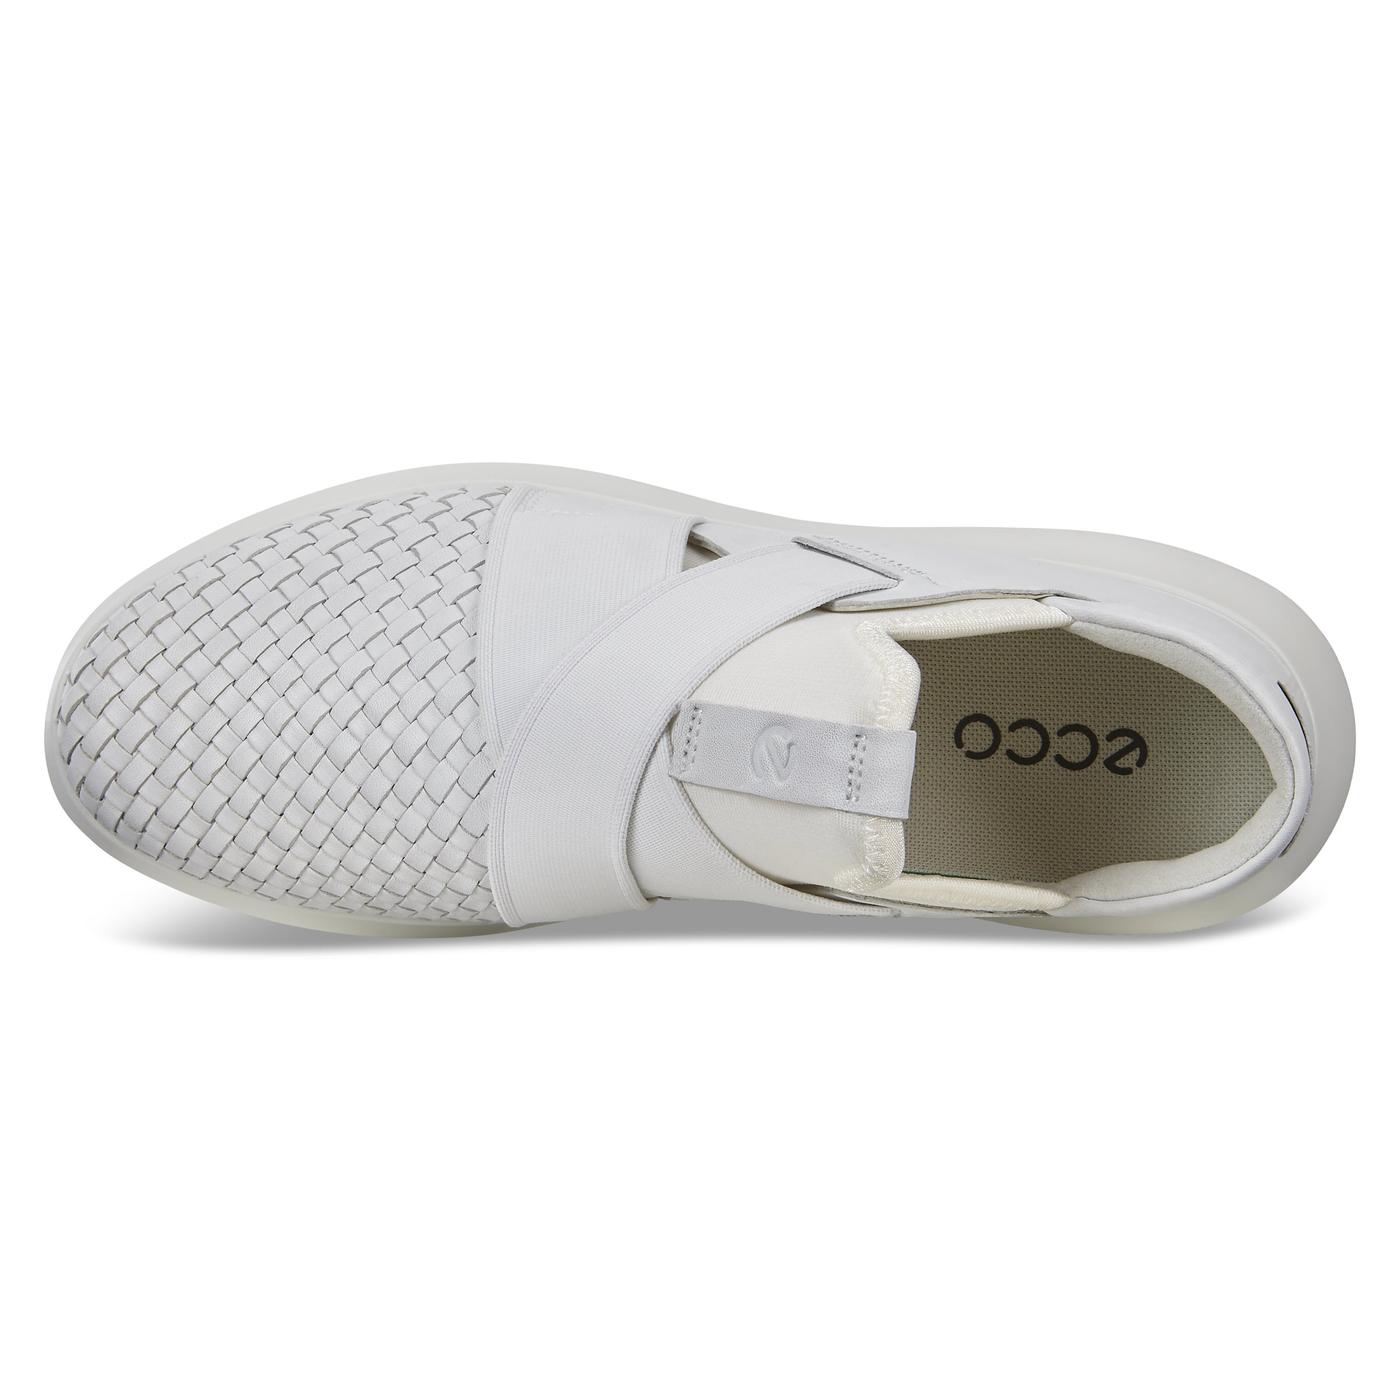 ECCO 여성 스니커즈 시냅스 450623-50874